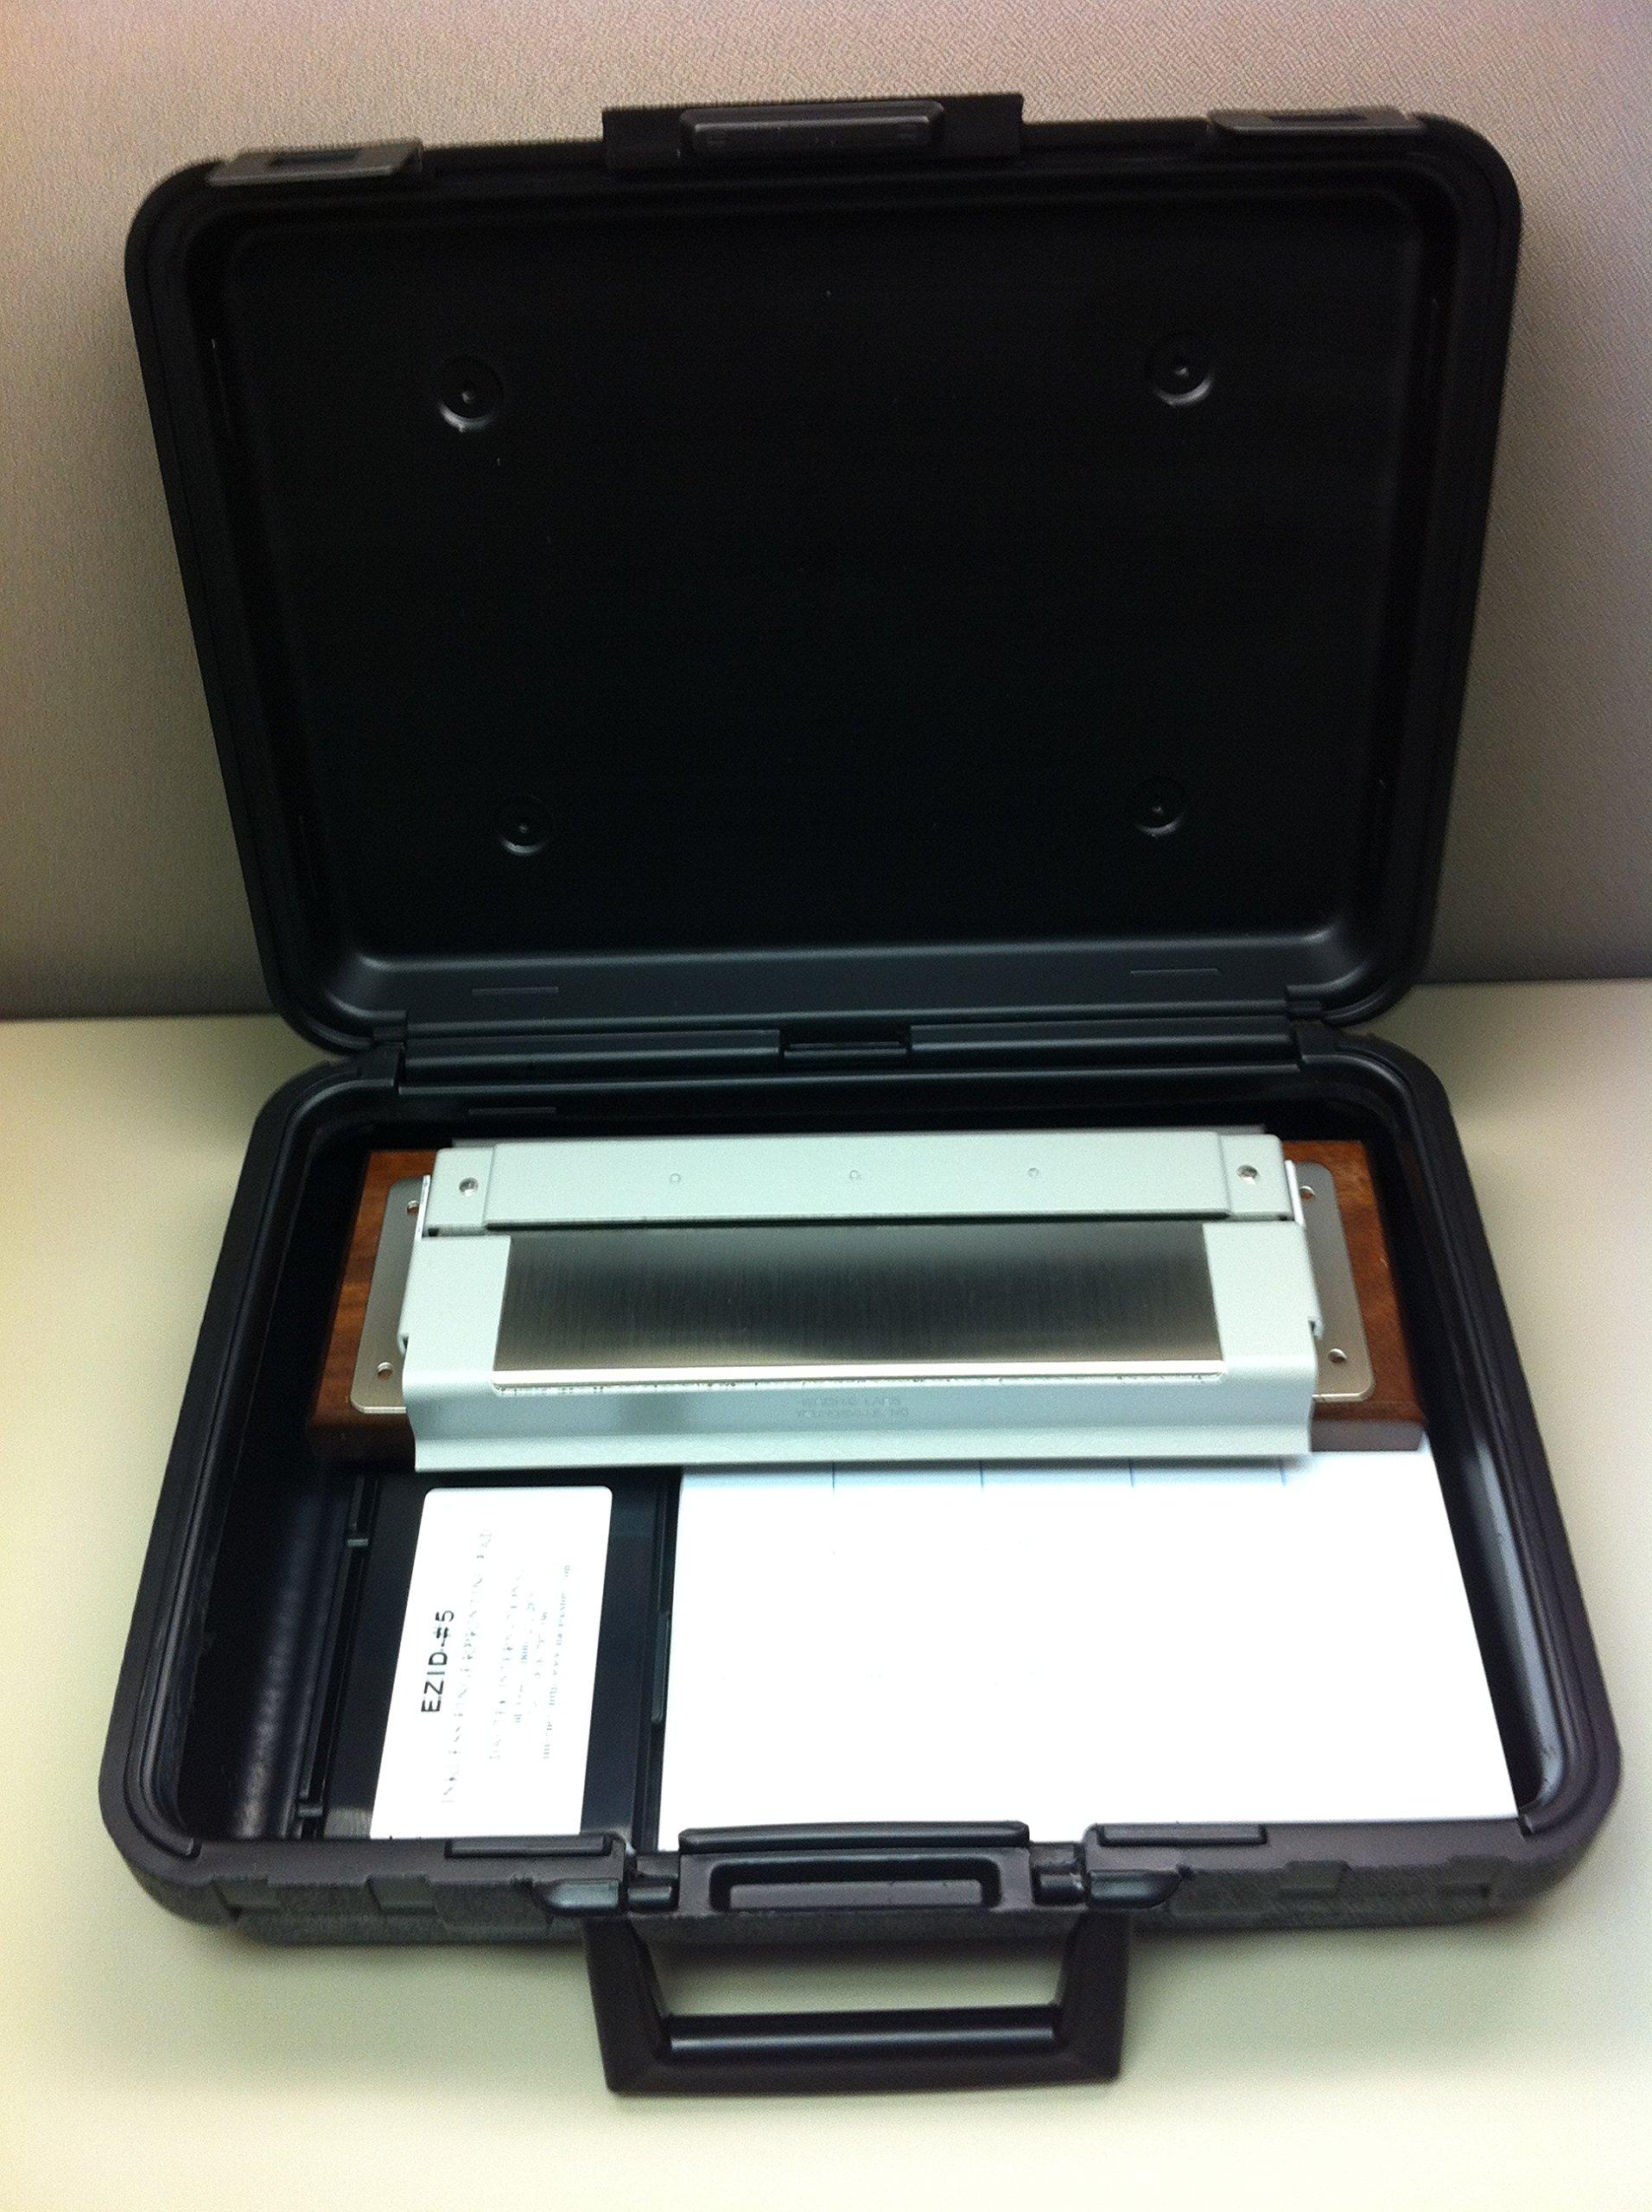 Professional Inkless Portable Fingerprint Workstation